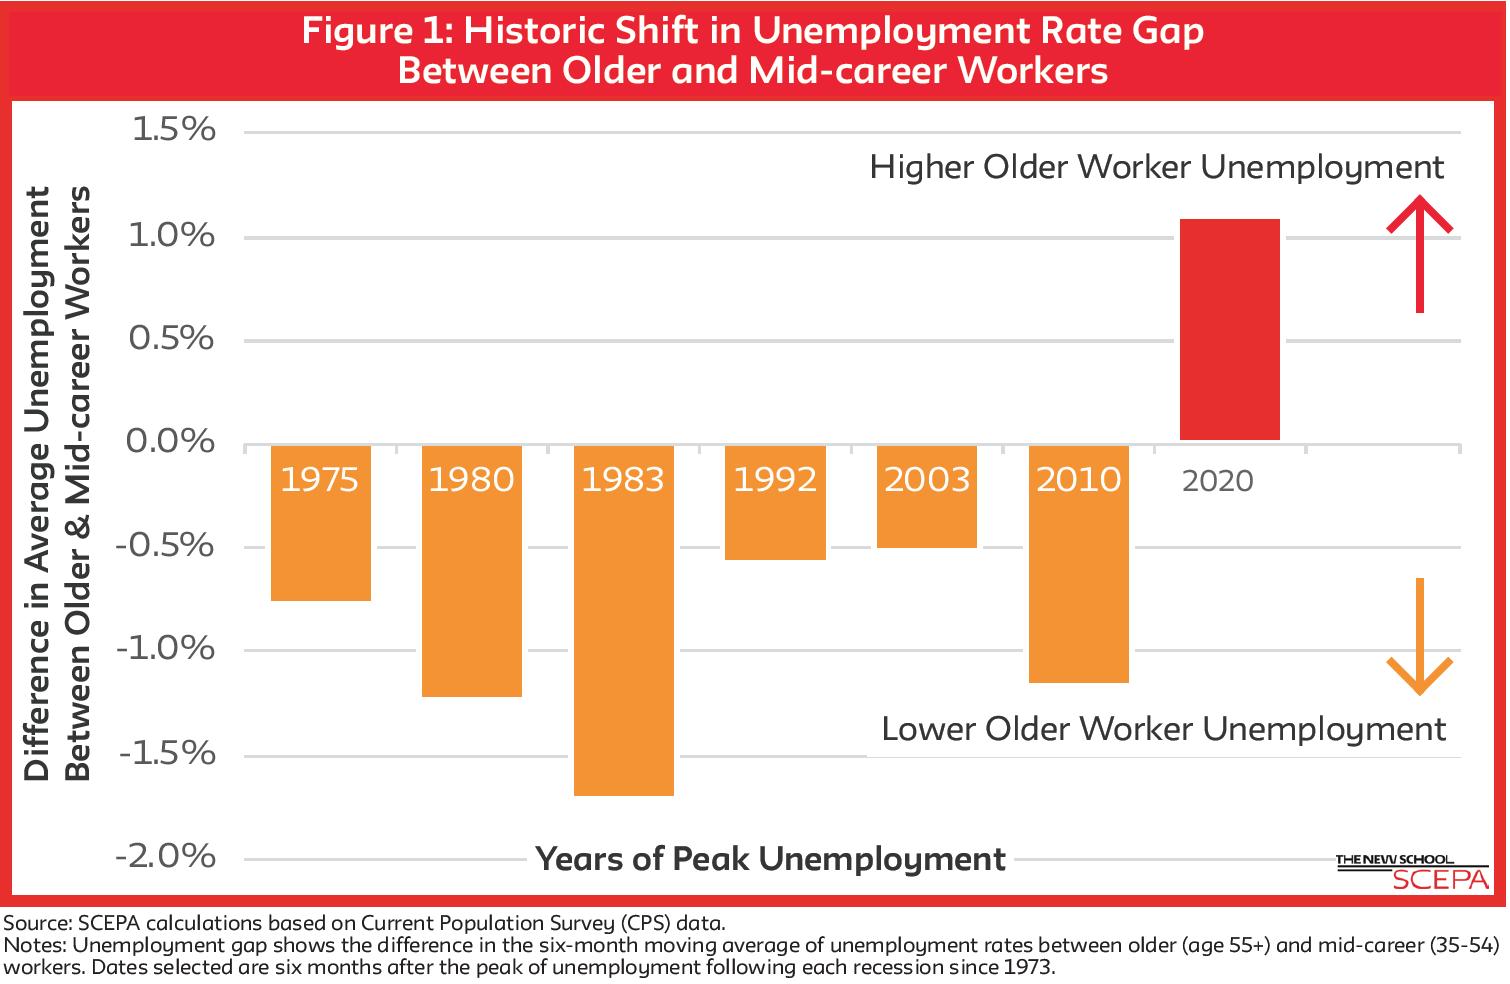 Years of Peak Unemployment